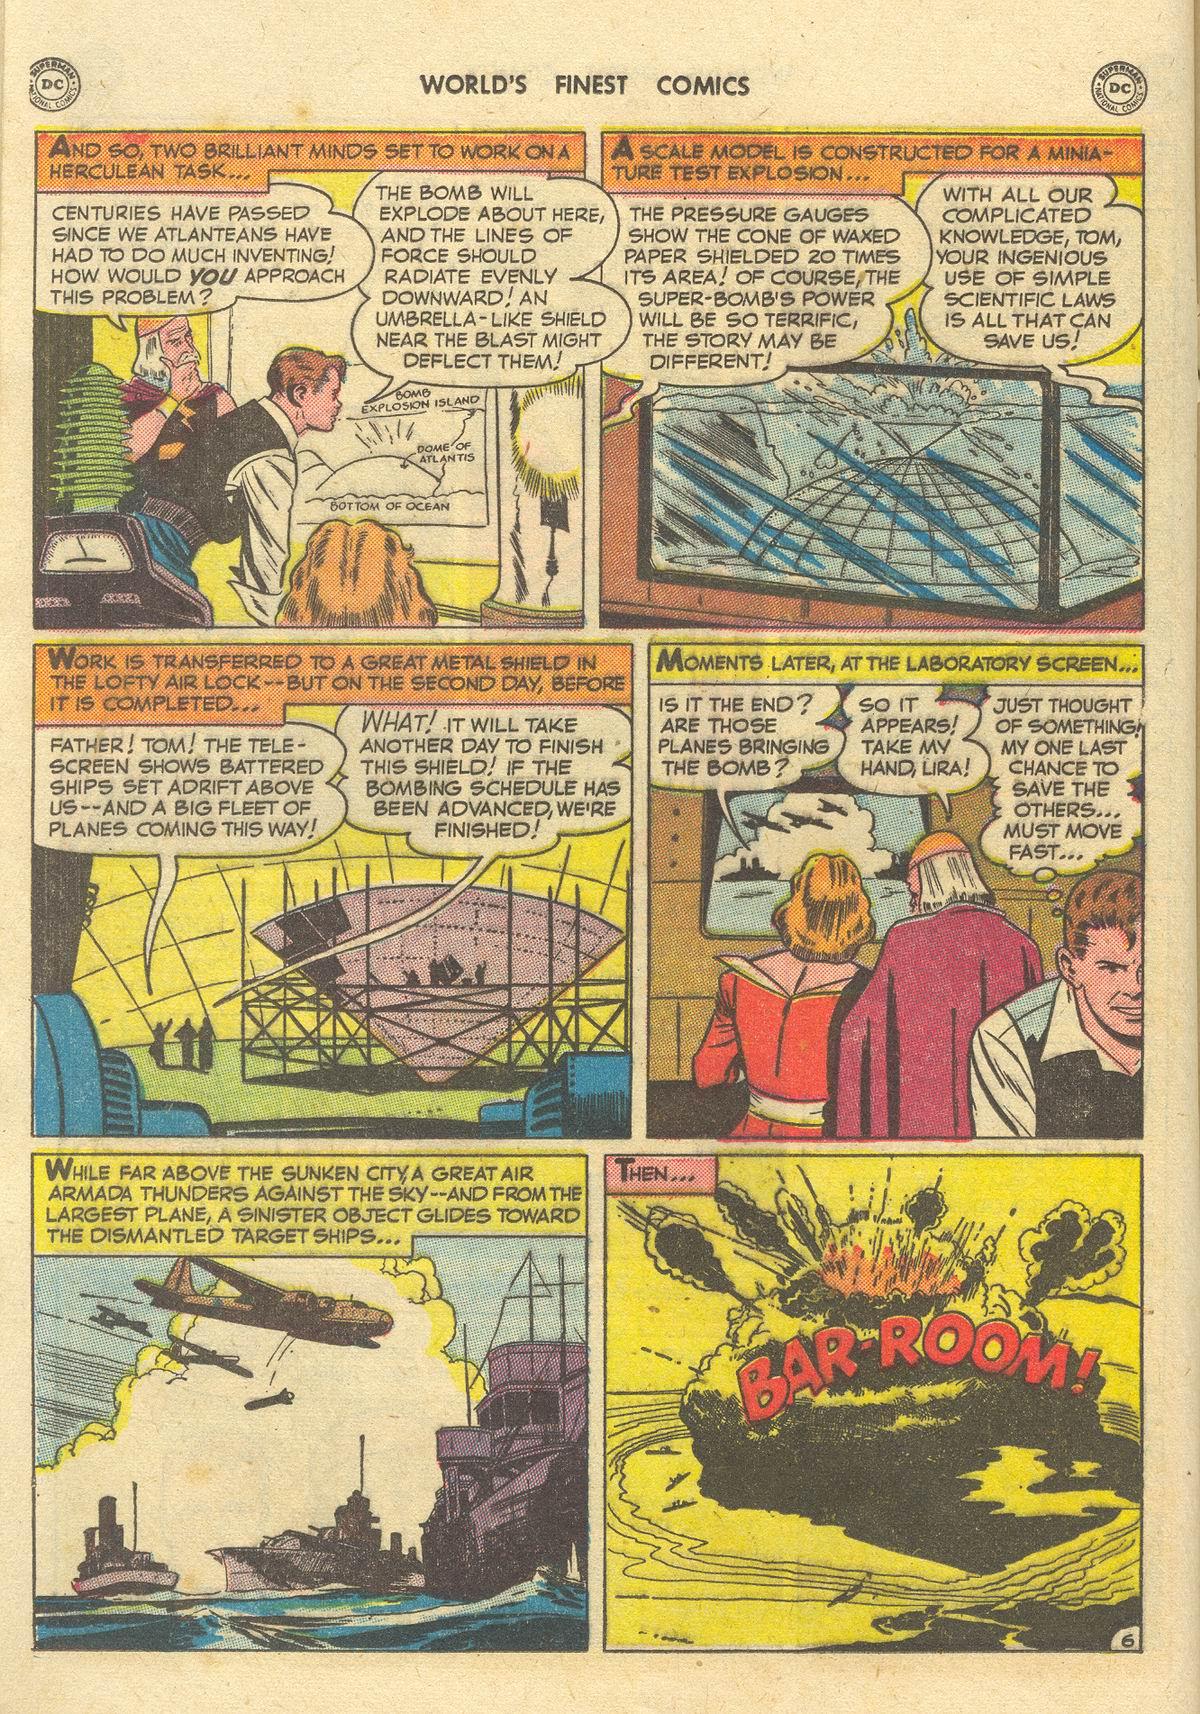 Read online World's Finest Comics comic -  Issue #51 - 34